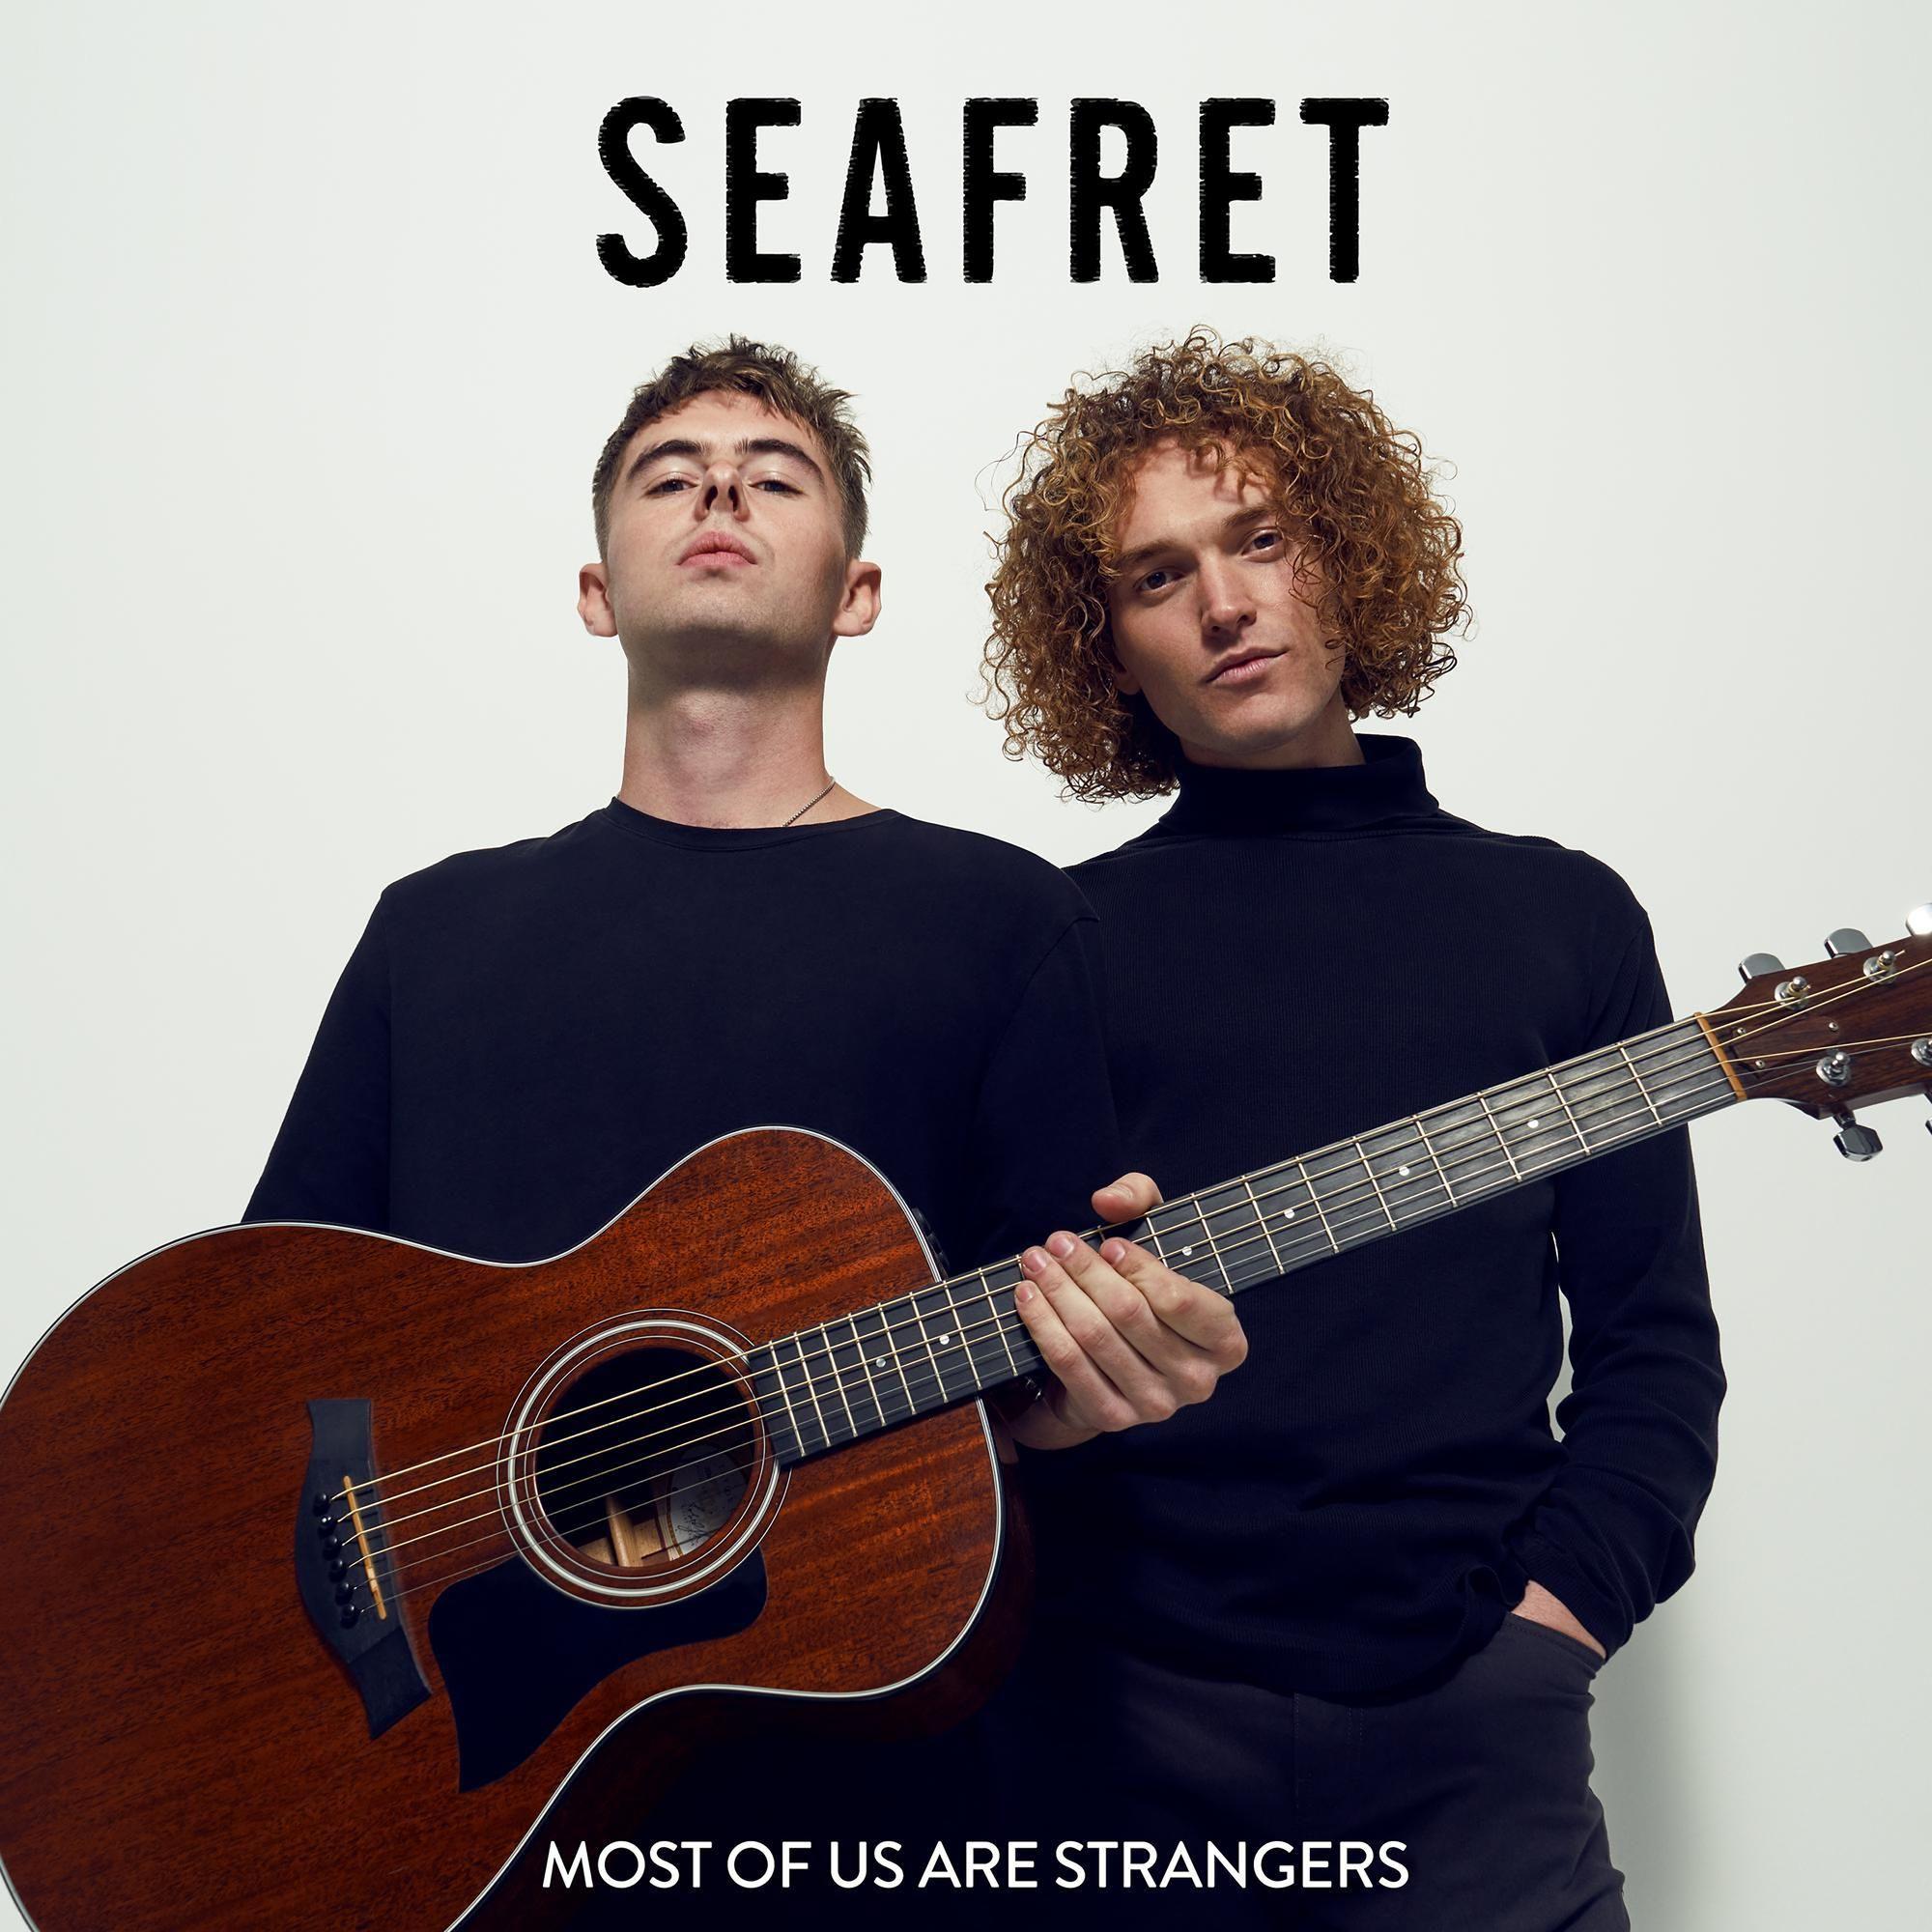 seafret most of us are strangers album artwork